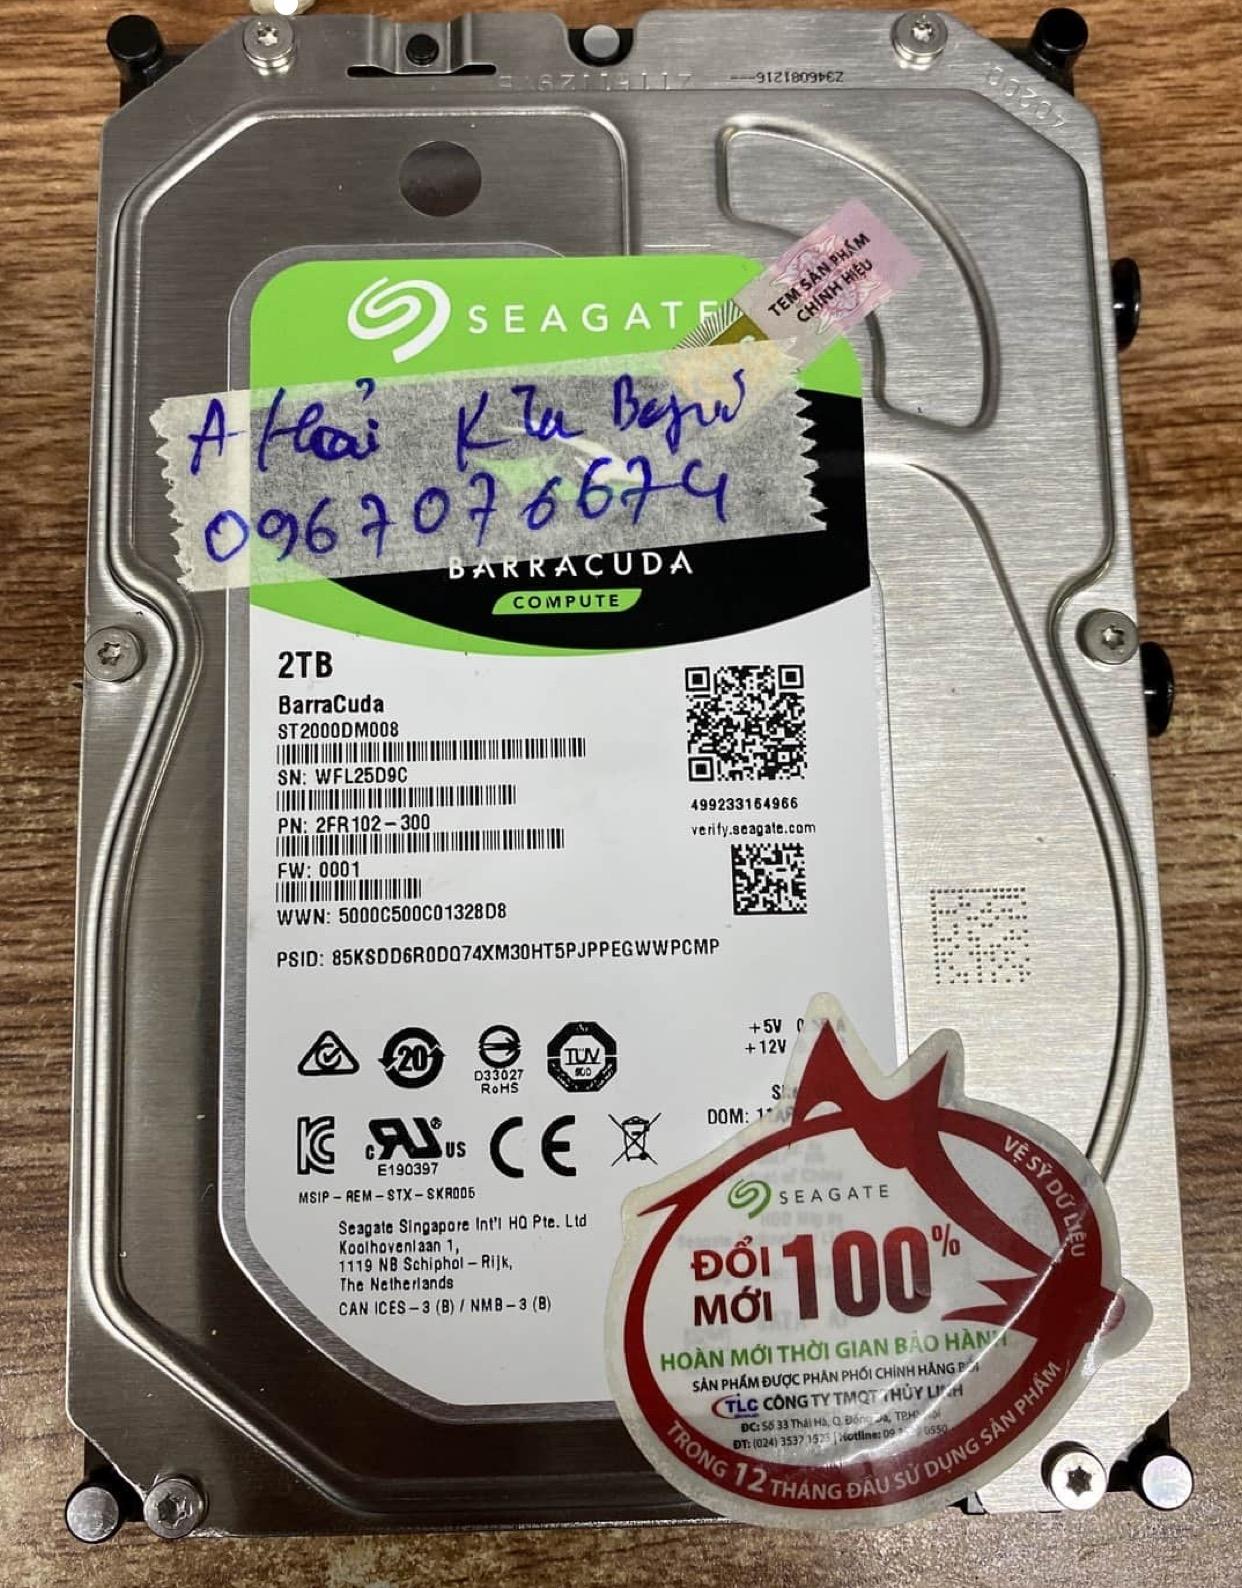 Cứu dữ liệu ổ cứng Seagate 2TB bad 16/07/2020 - cuumaytinh